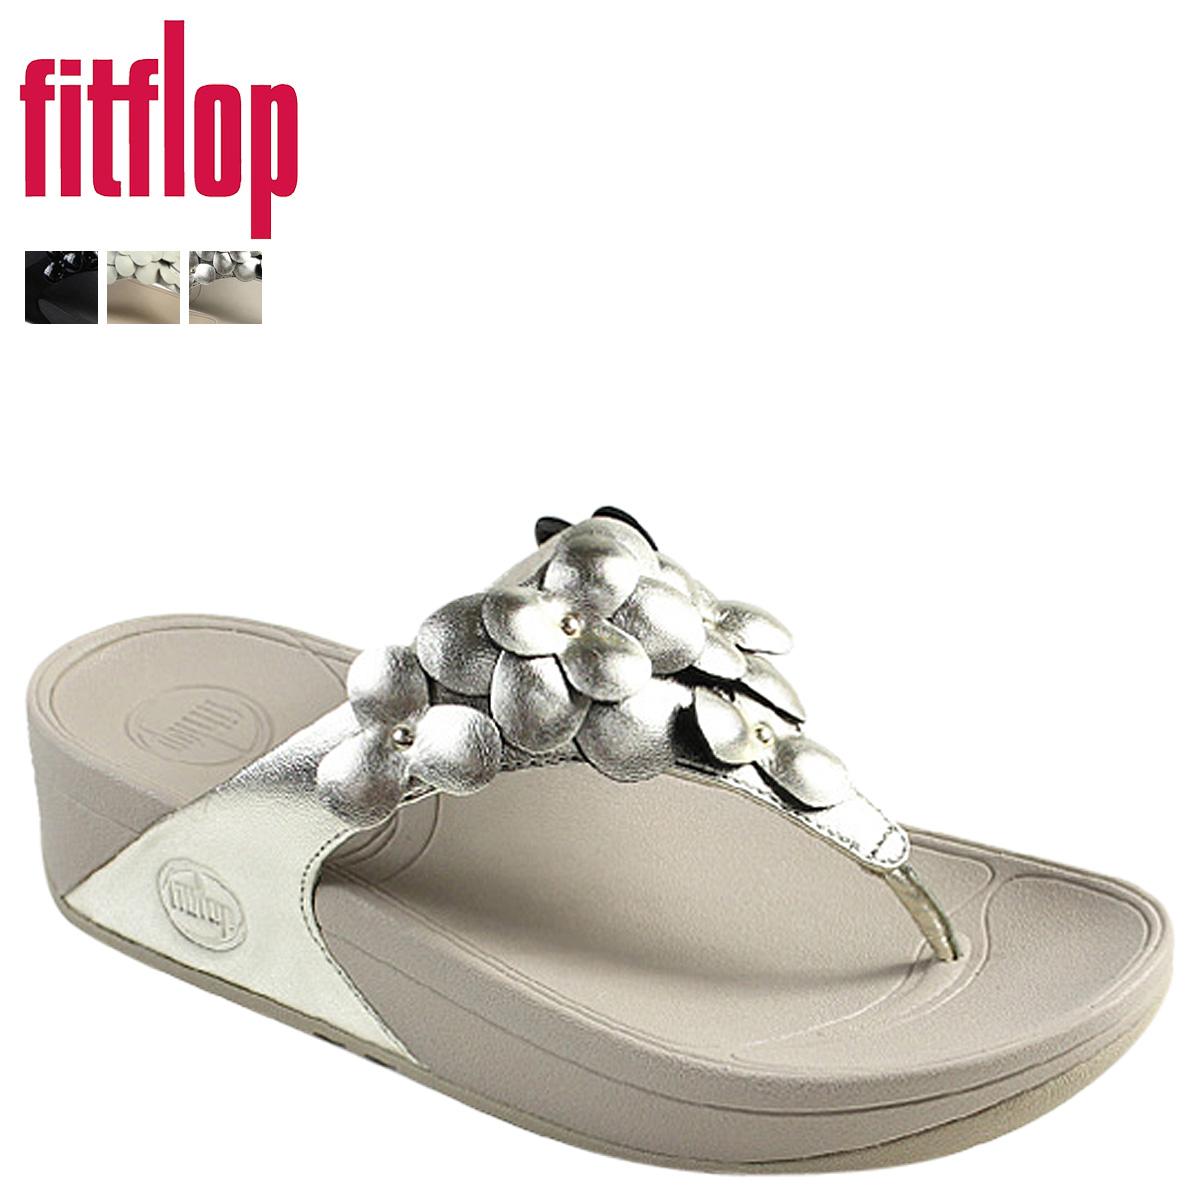 [SOLD OUT]合身FLOP FitFlop凉鞋3彩色180-001 180-010 180-194 FLEUR SANDAL皮革富勒女士